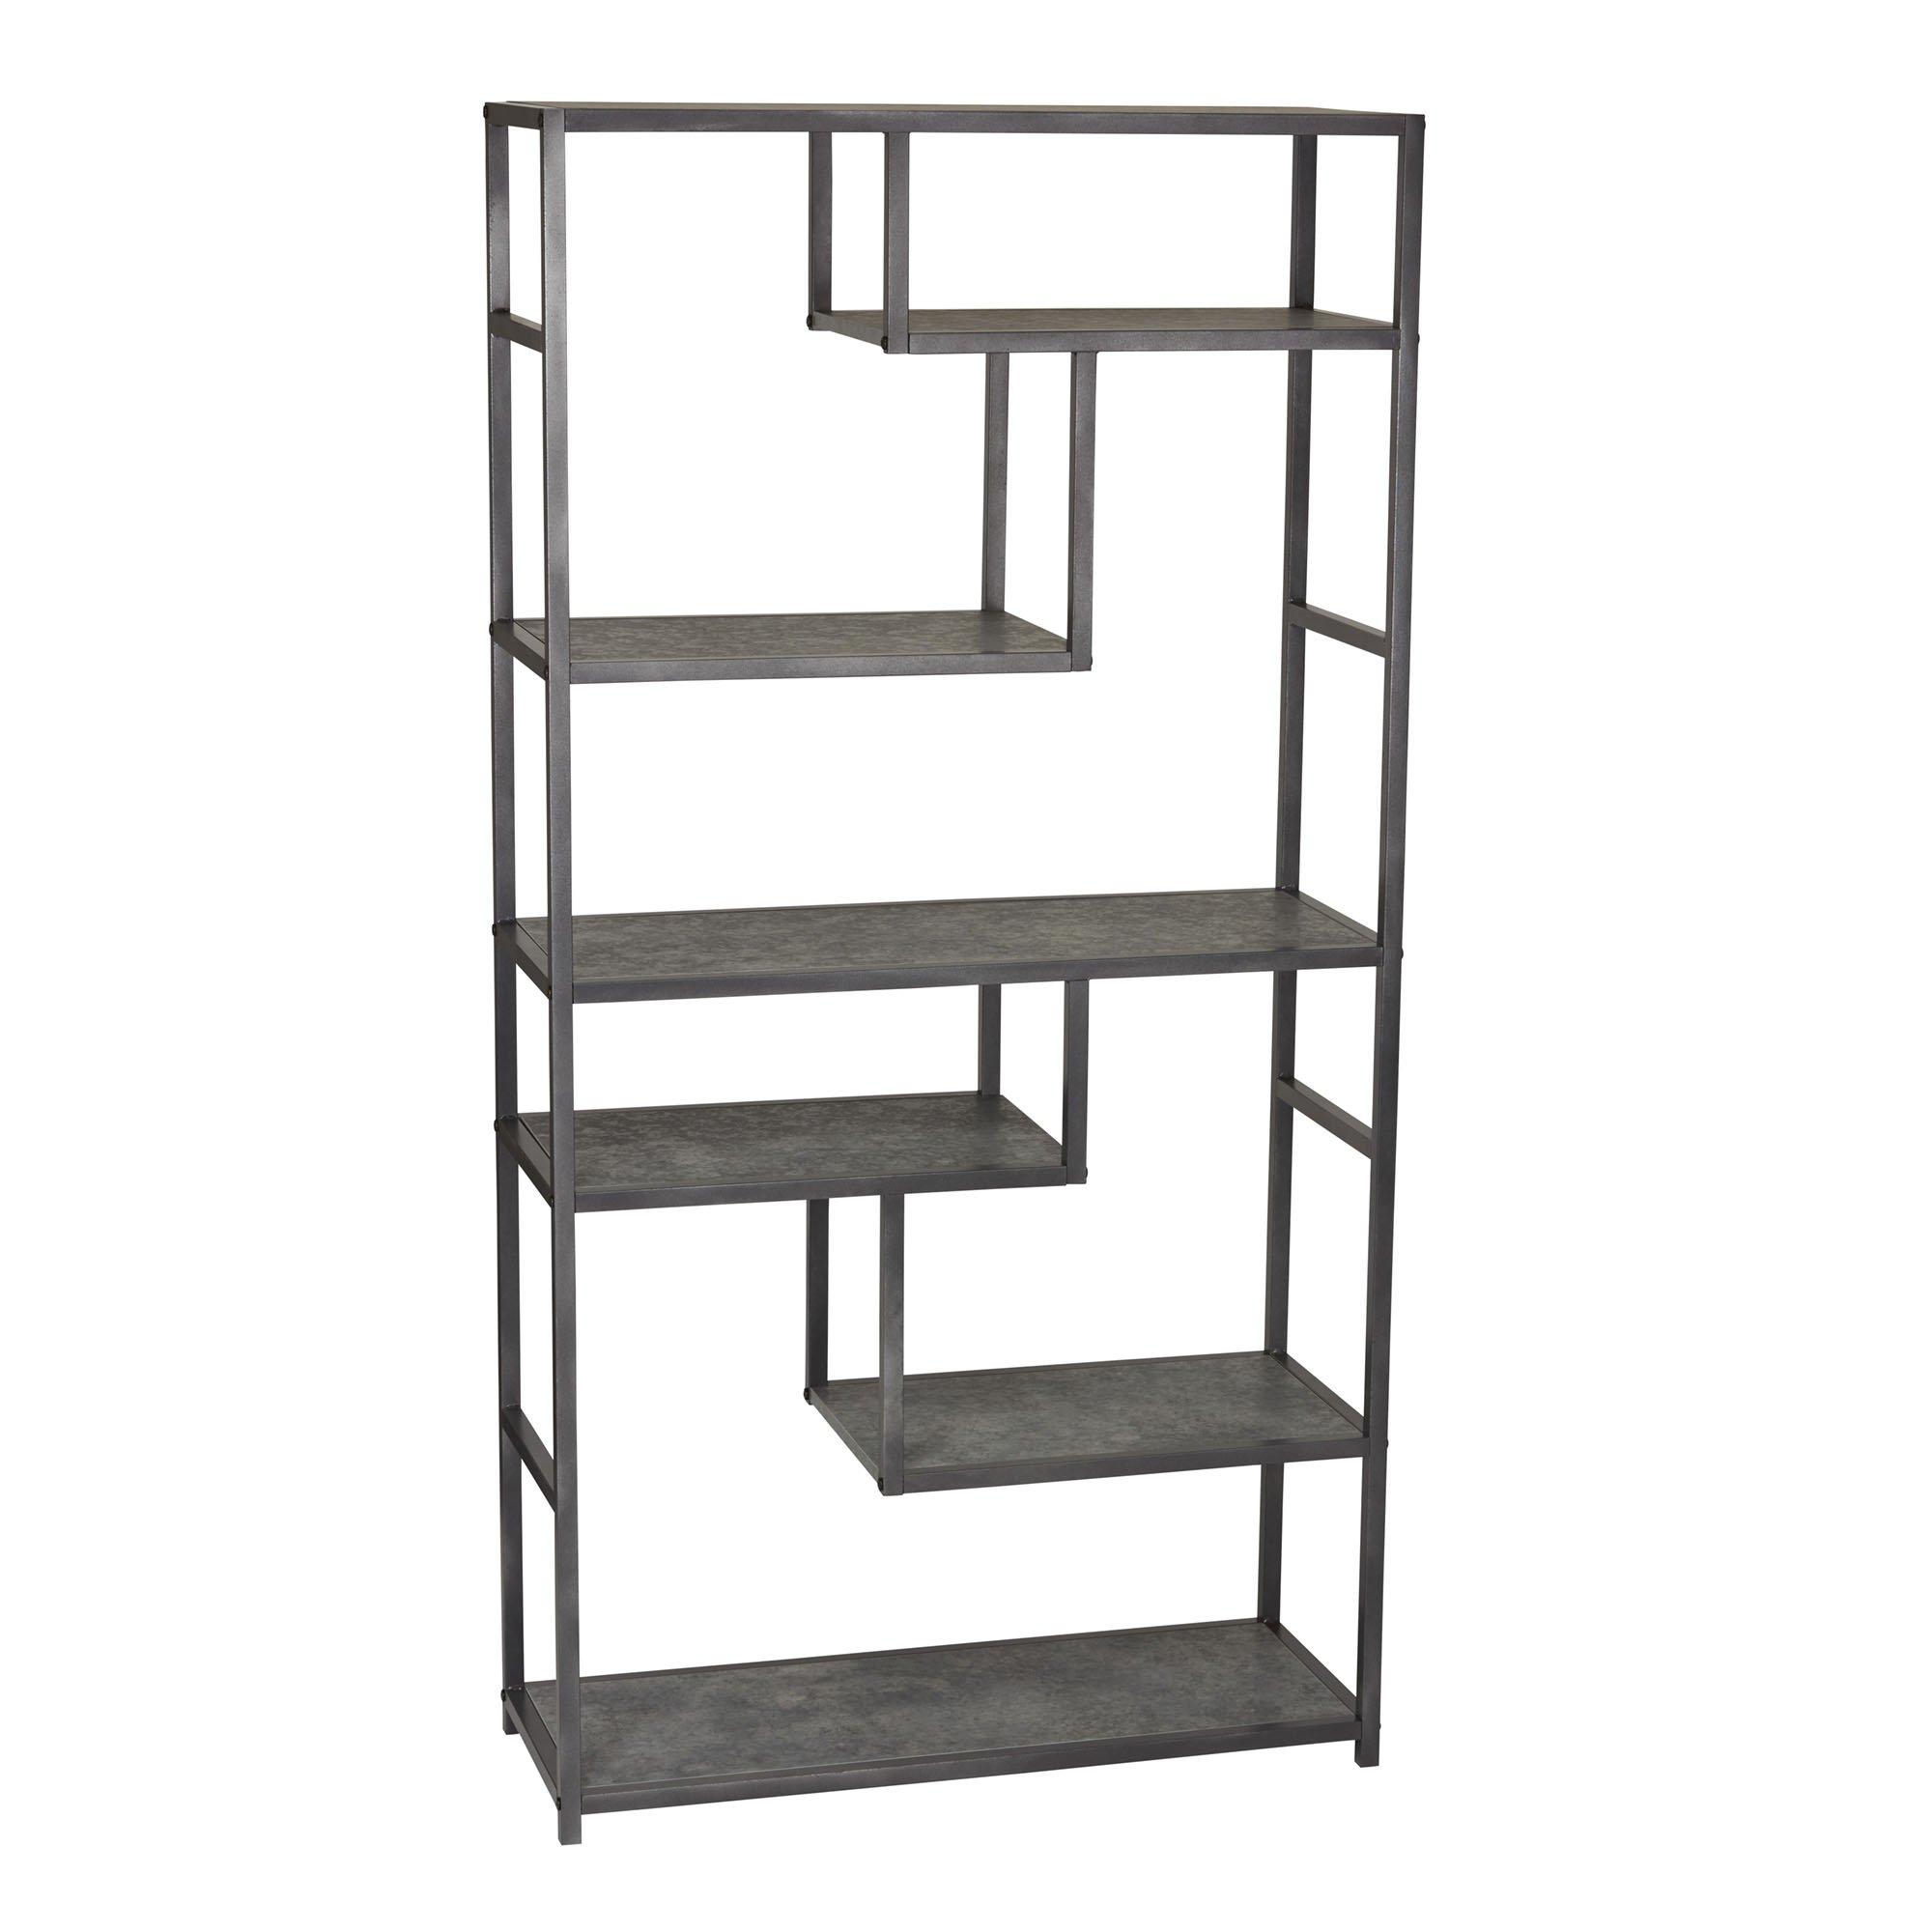 Household Essentials 8090-1 Tall Open Bookcase | Geometric Storage Shelves | Faux Slate Concrete